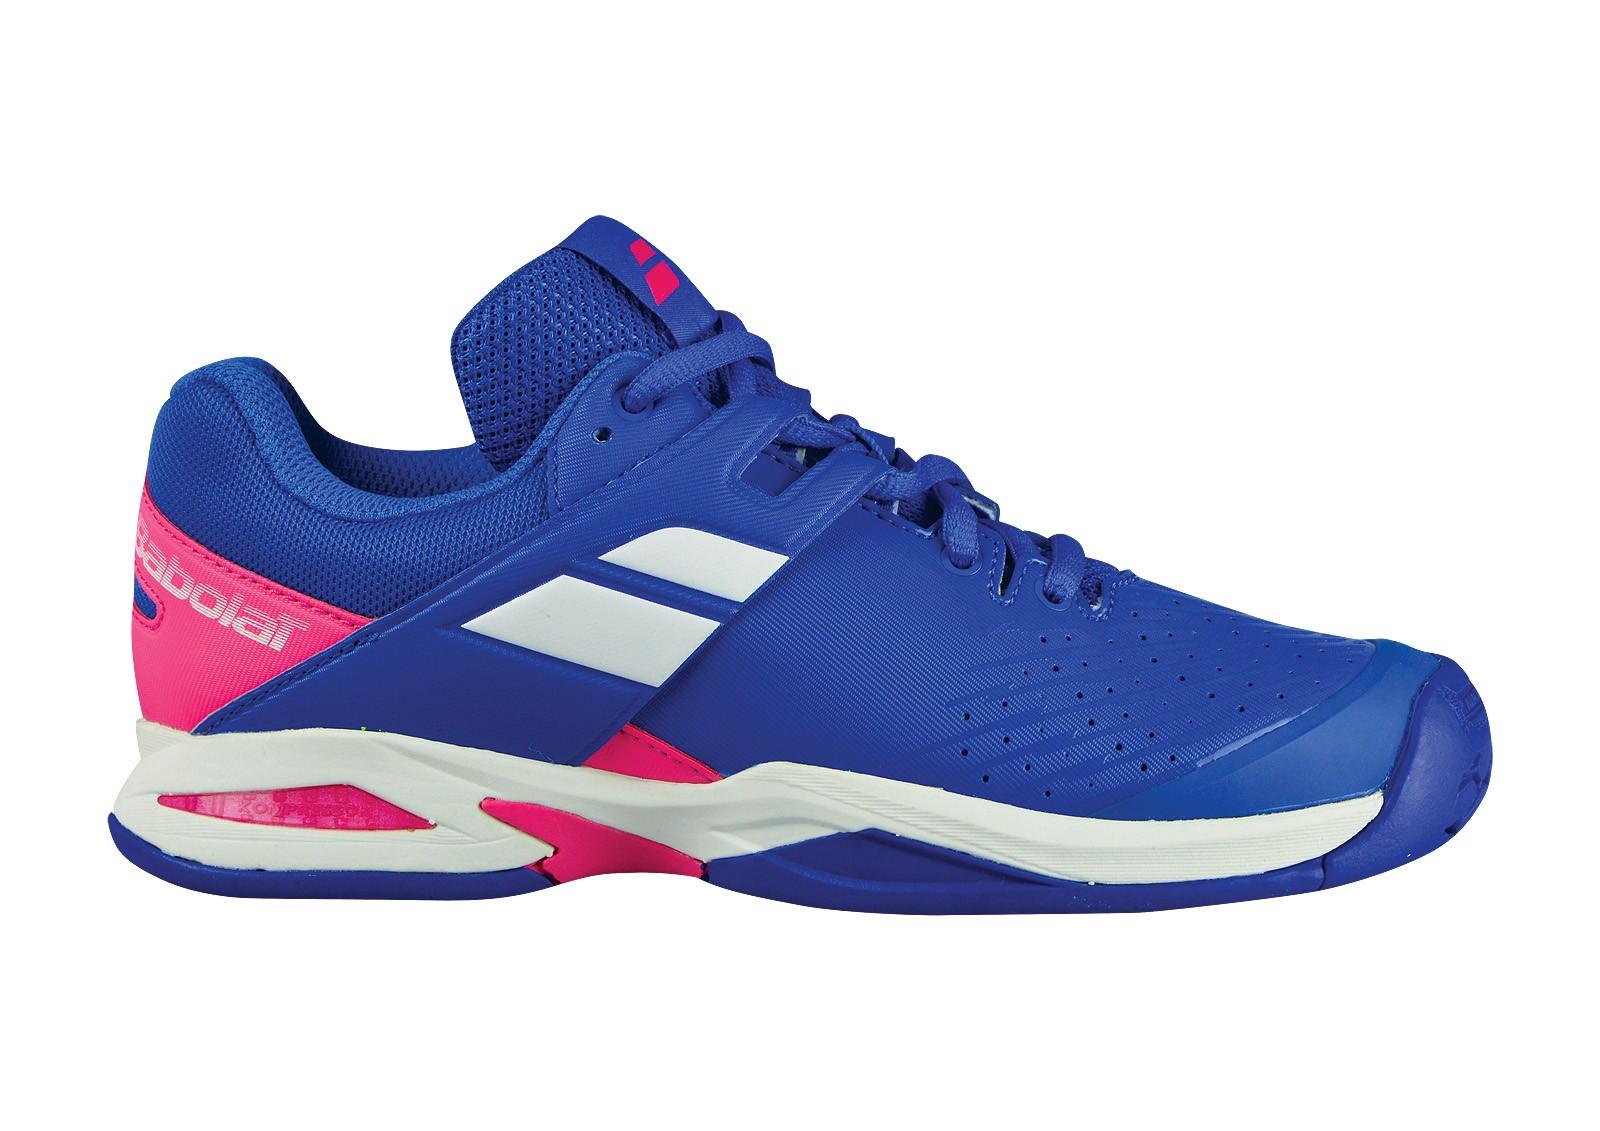 Buty tenisowe Babolat Propulse Junior Princess Blue - Wyprzedaż!